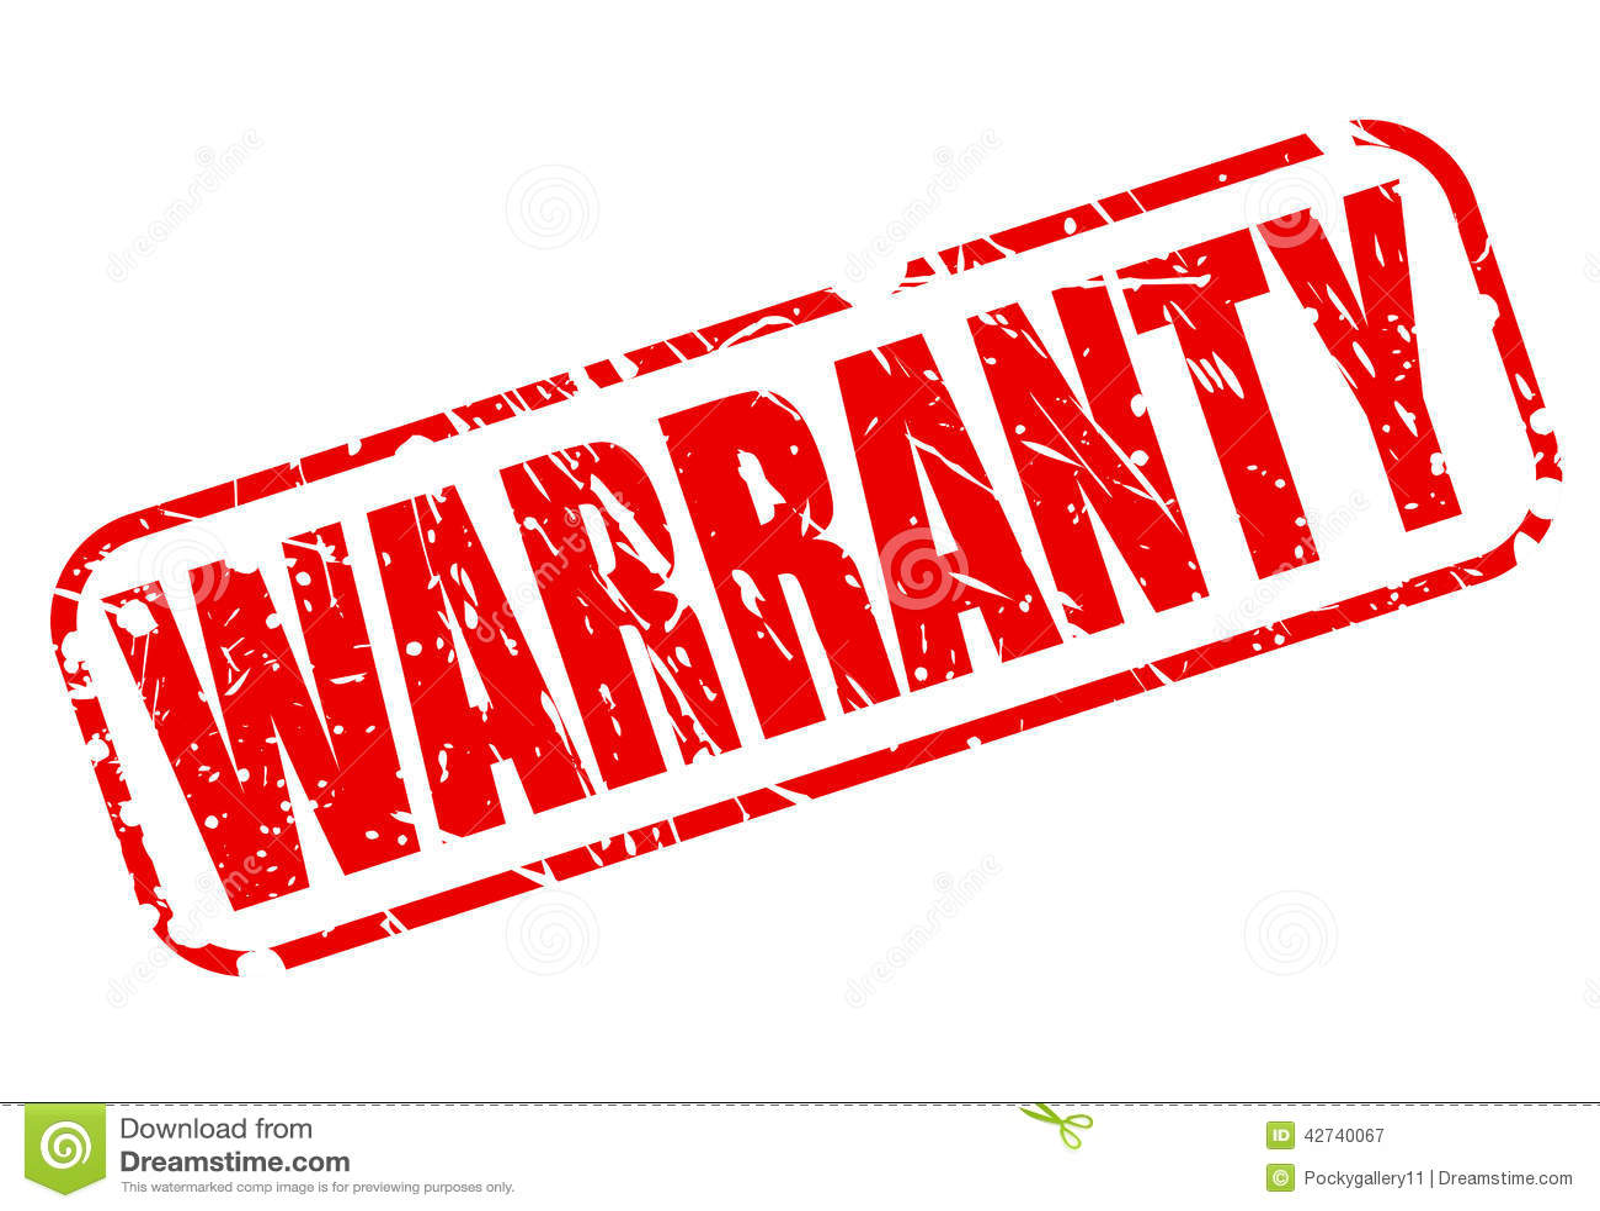 No Warranty On Website Design